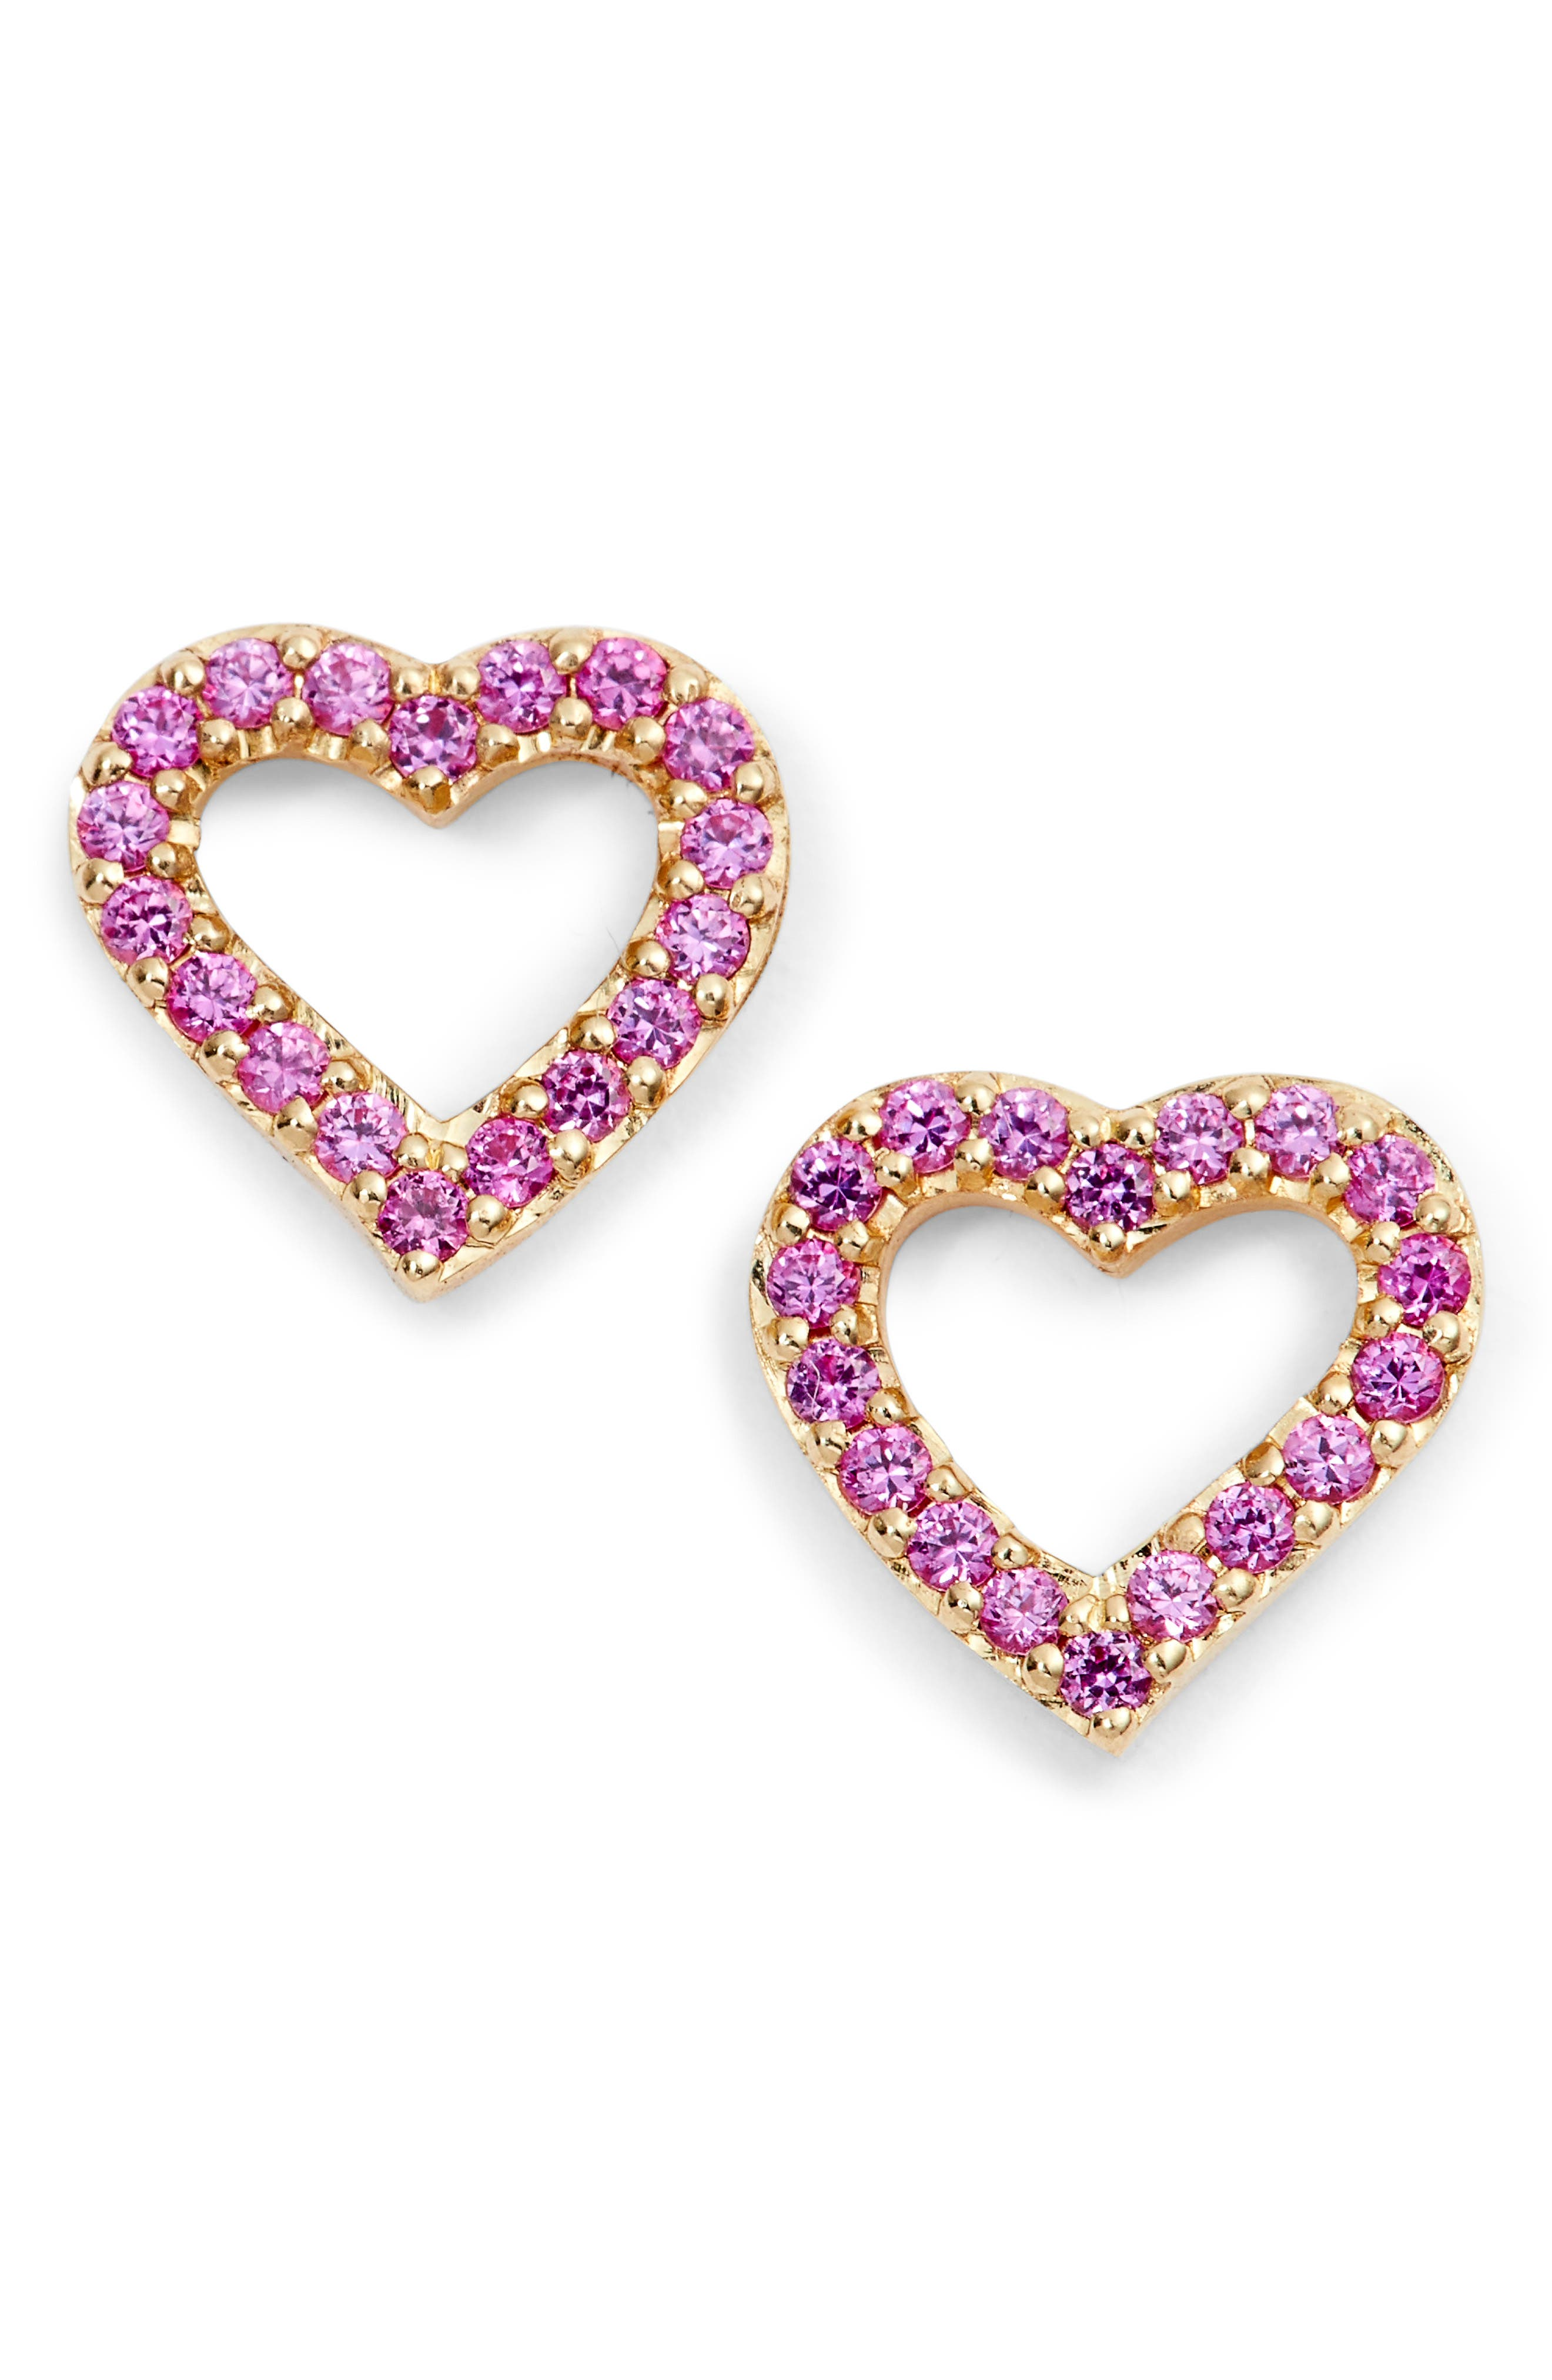 Mini Heart Sapphire Stud Earrings,                             Main thumbnail 1, color,                             710